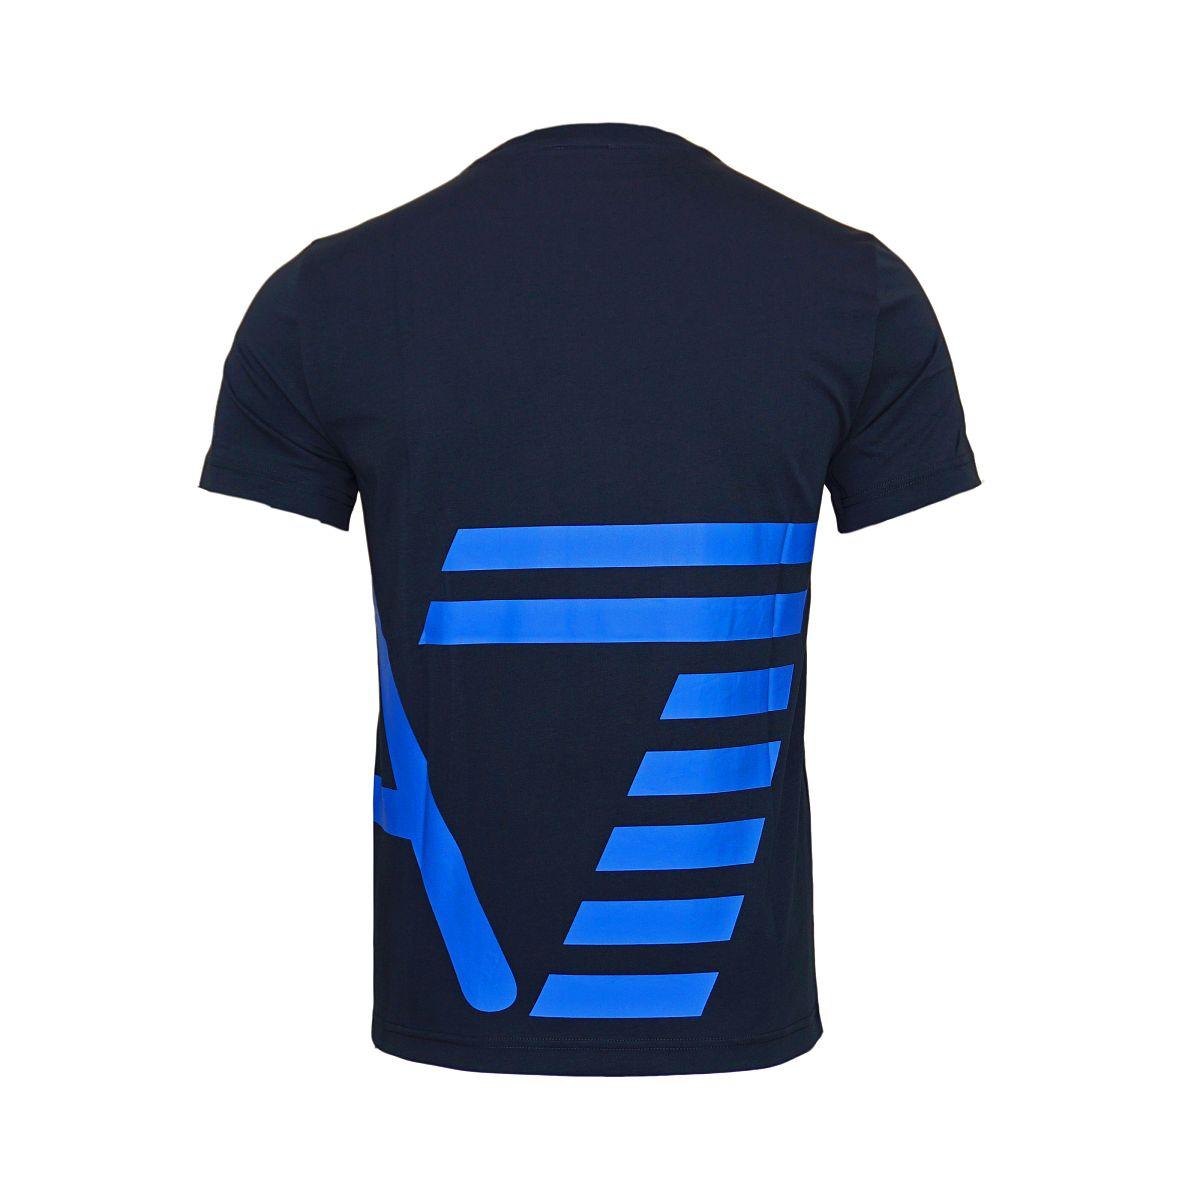 EA7 Emporio Armani T-Shirt Rundhals 6YPTB8 PJH7Z 1578 Night Blue HW17-EATS1